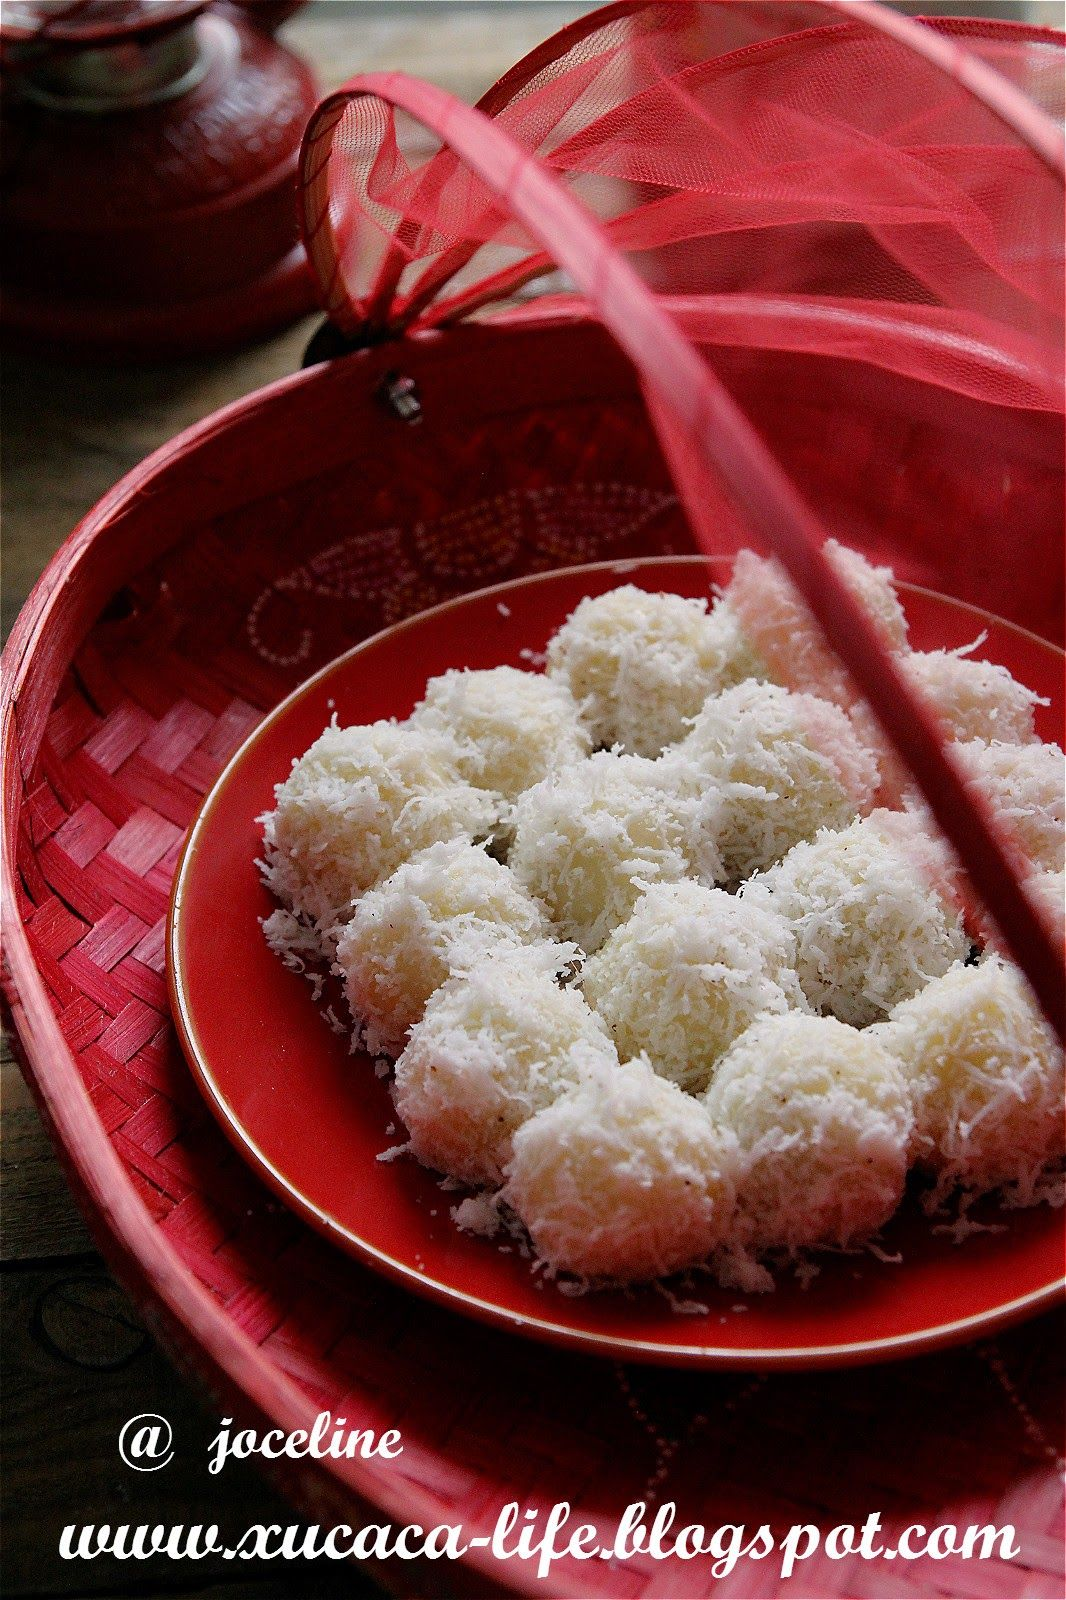 Butter . Flour & Me      爱的心灵之约: 马铃薯椰糖粒(Potato Ondeh Ondeh)